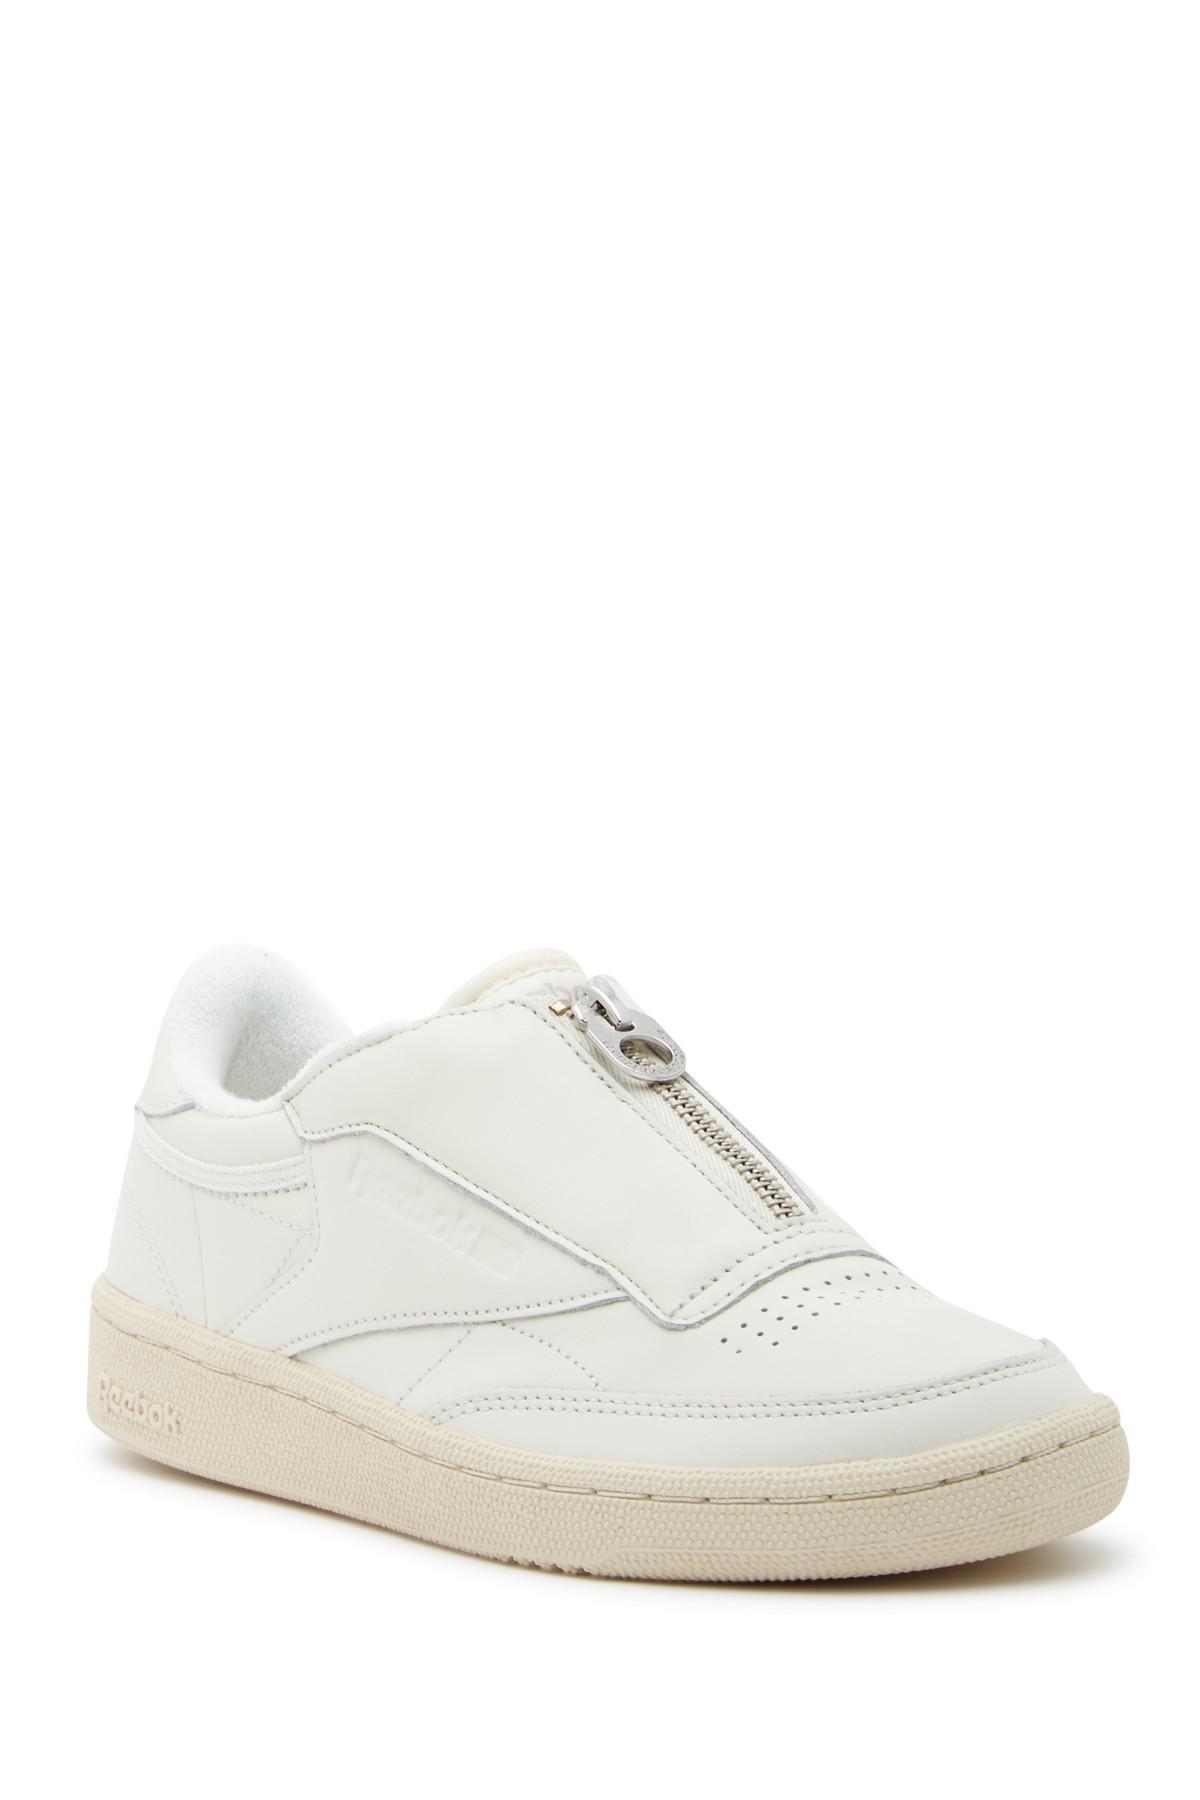 Reebok Leather Club C 85 Zip Sneaker in